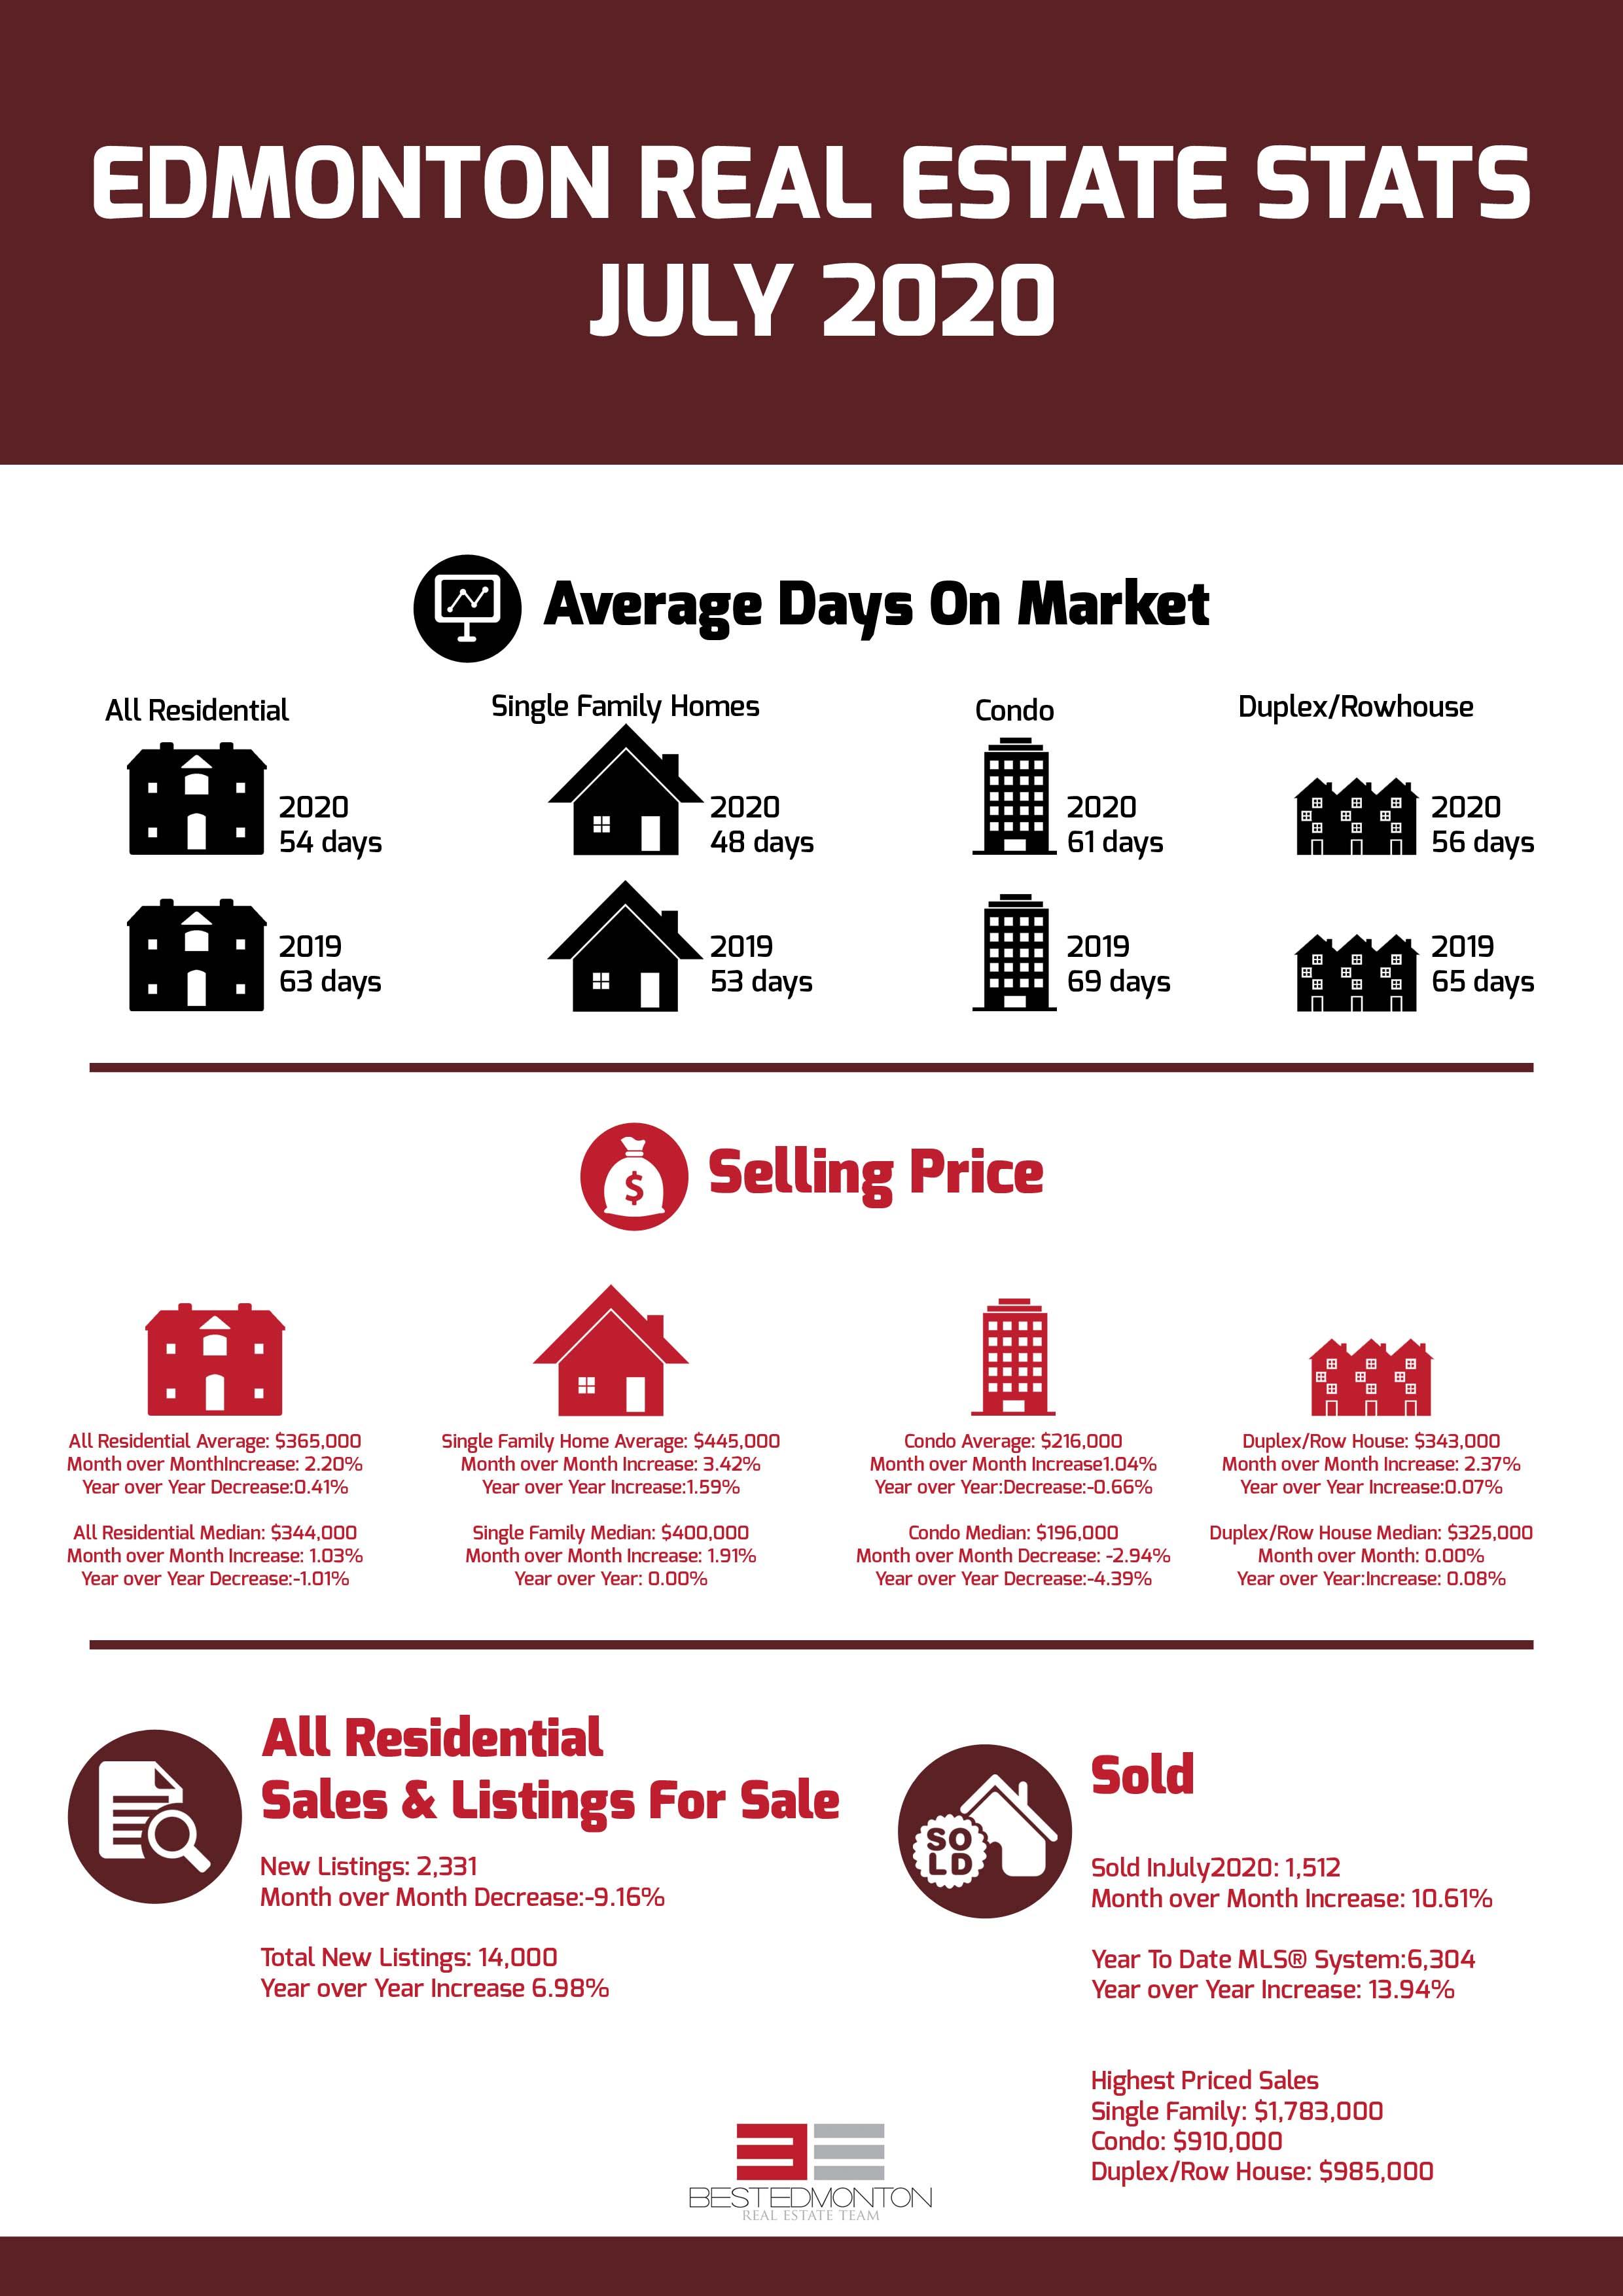 Edmonton Real Estate Stats July 2020